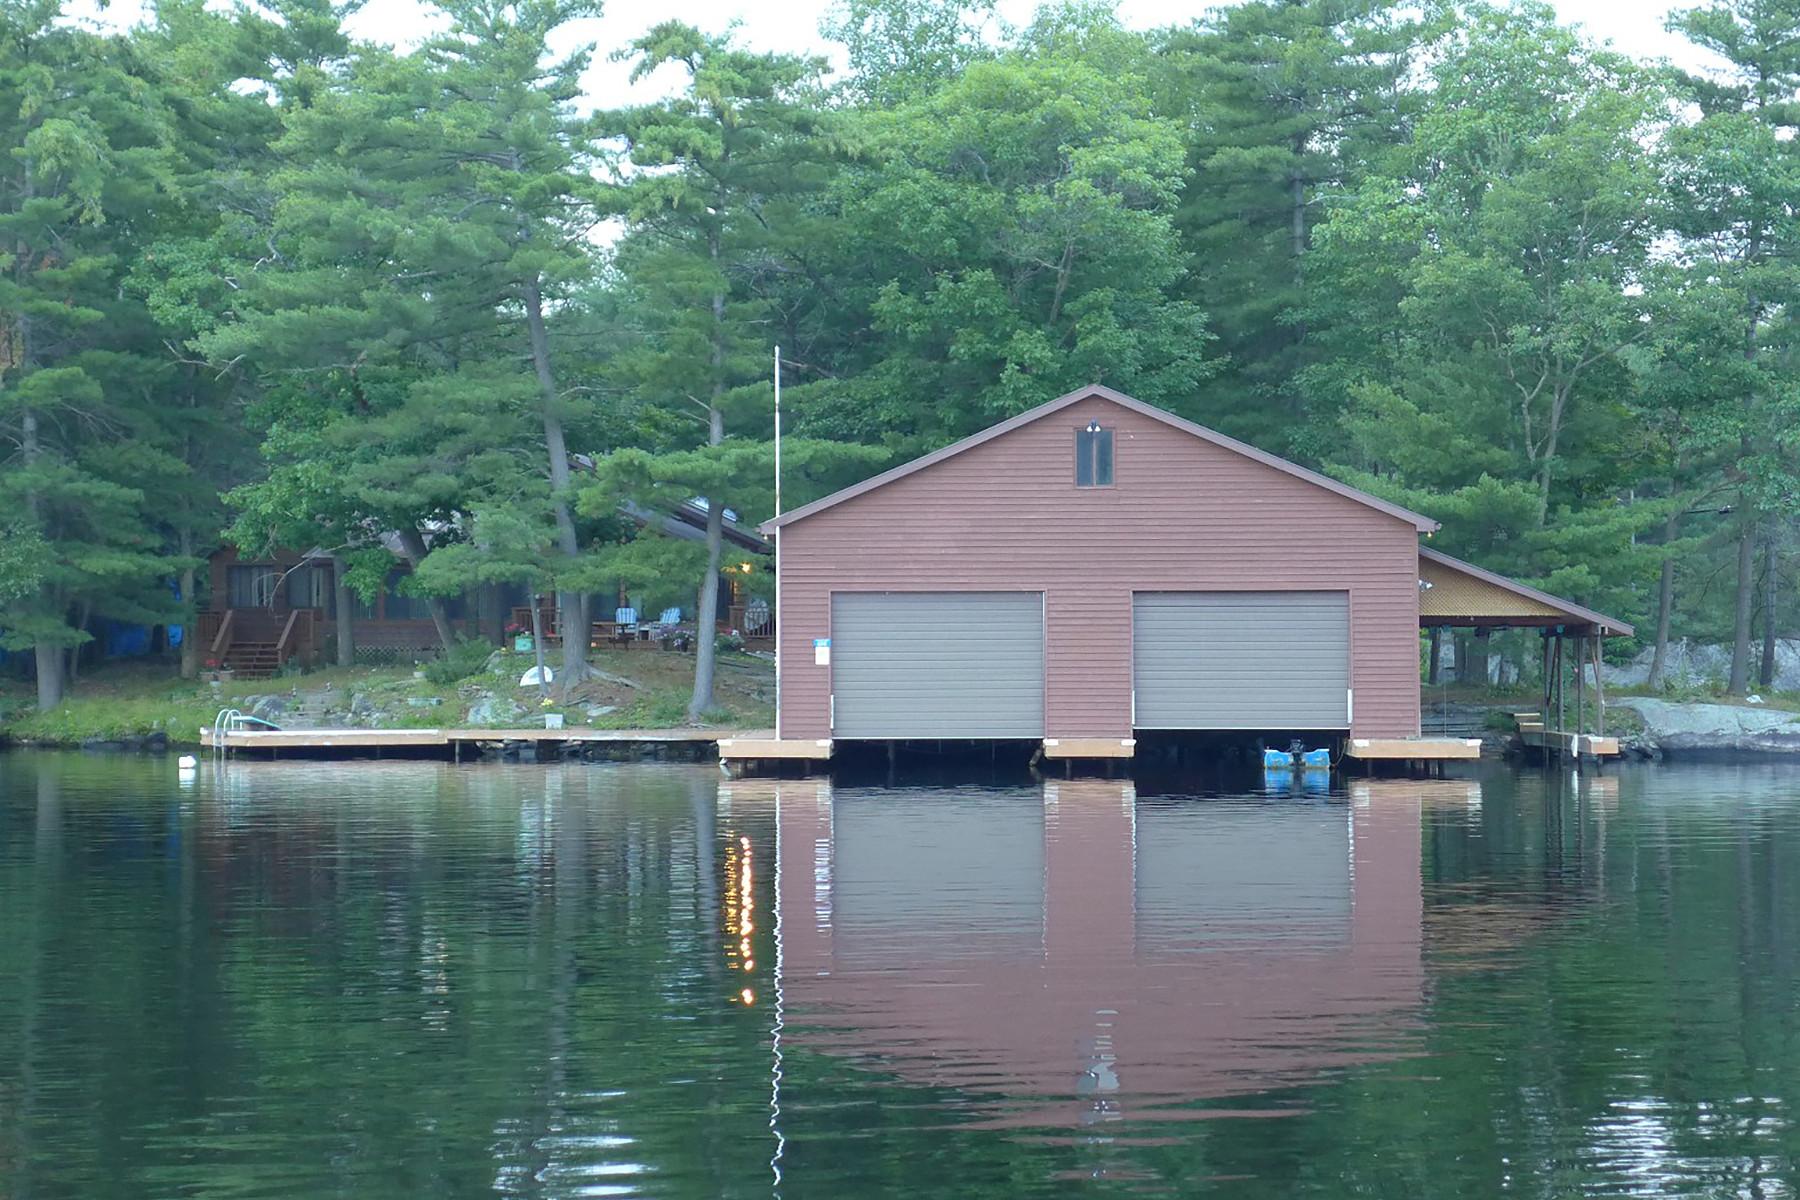 Casa Unifamiliar por un Venta en Georgian Bay Cottage 6041 Severn River Shore Georgian Bay, Ontario L0K1E0 Canadá